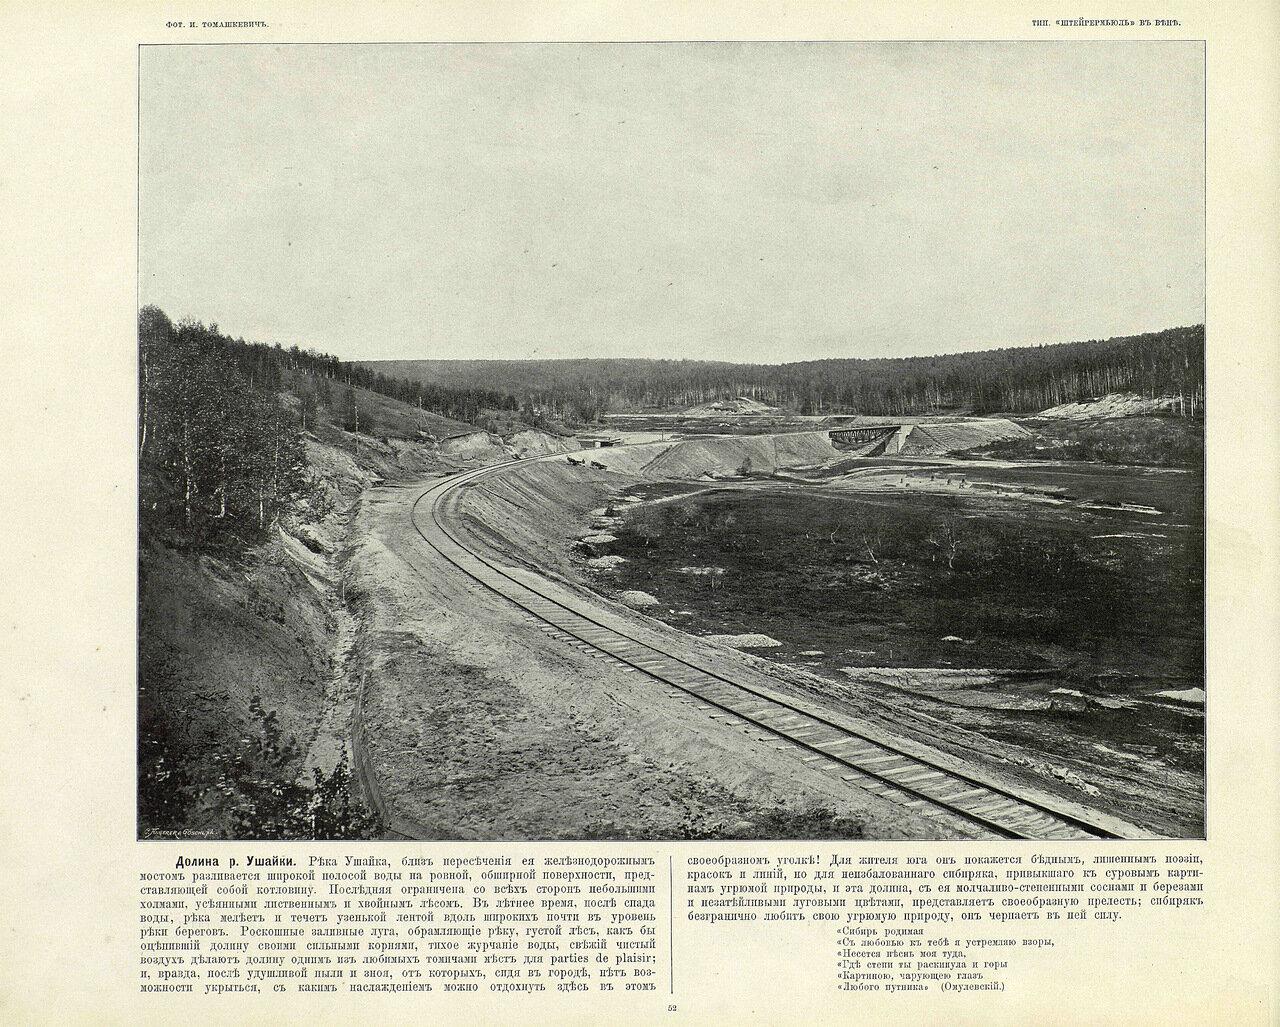 52. Долина реки Ушайки